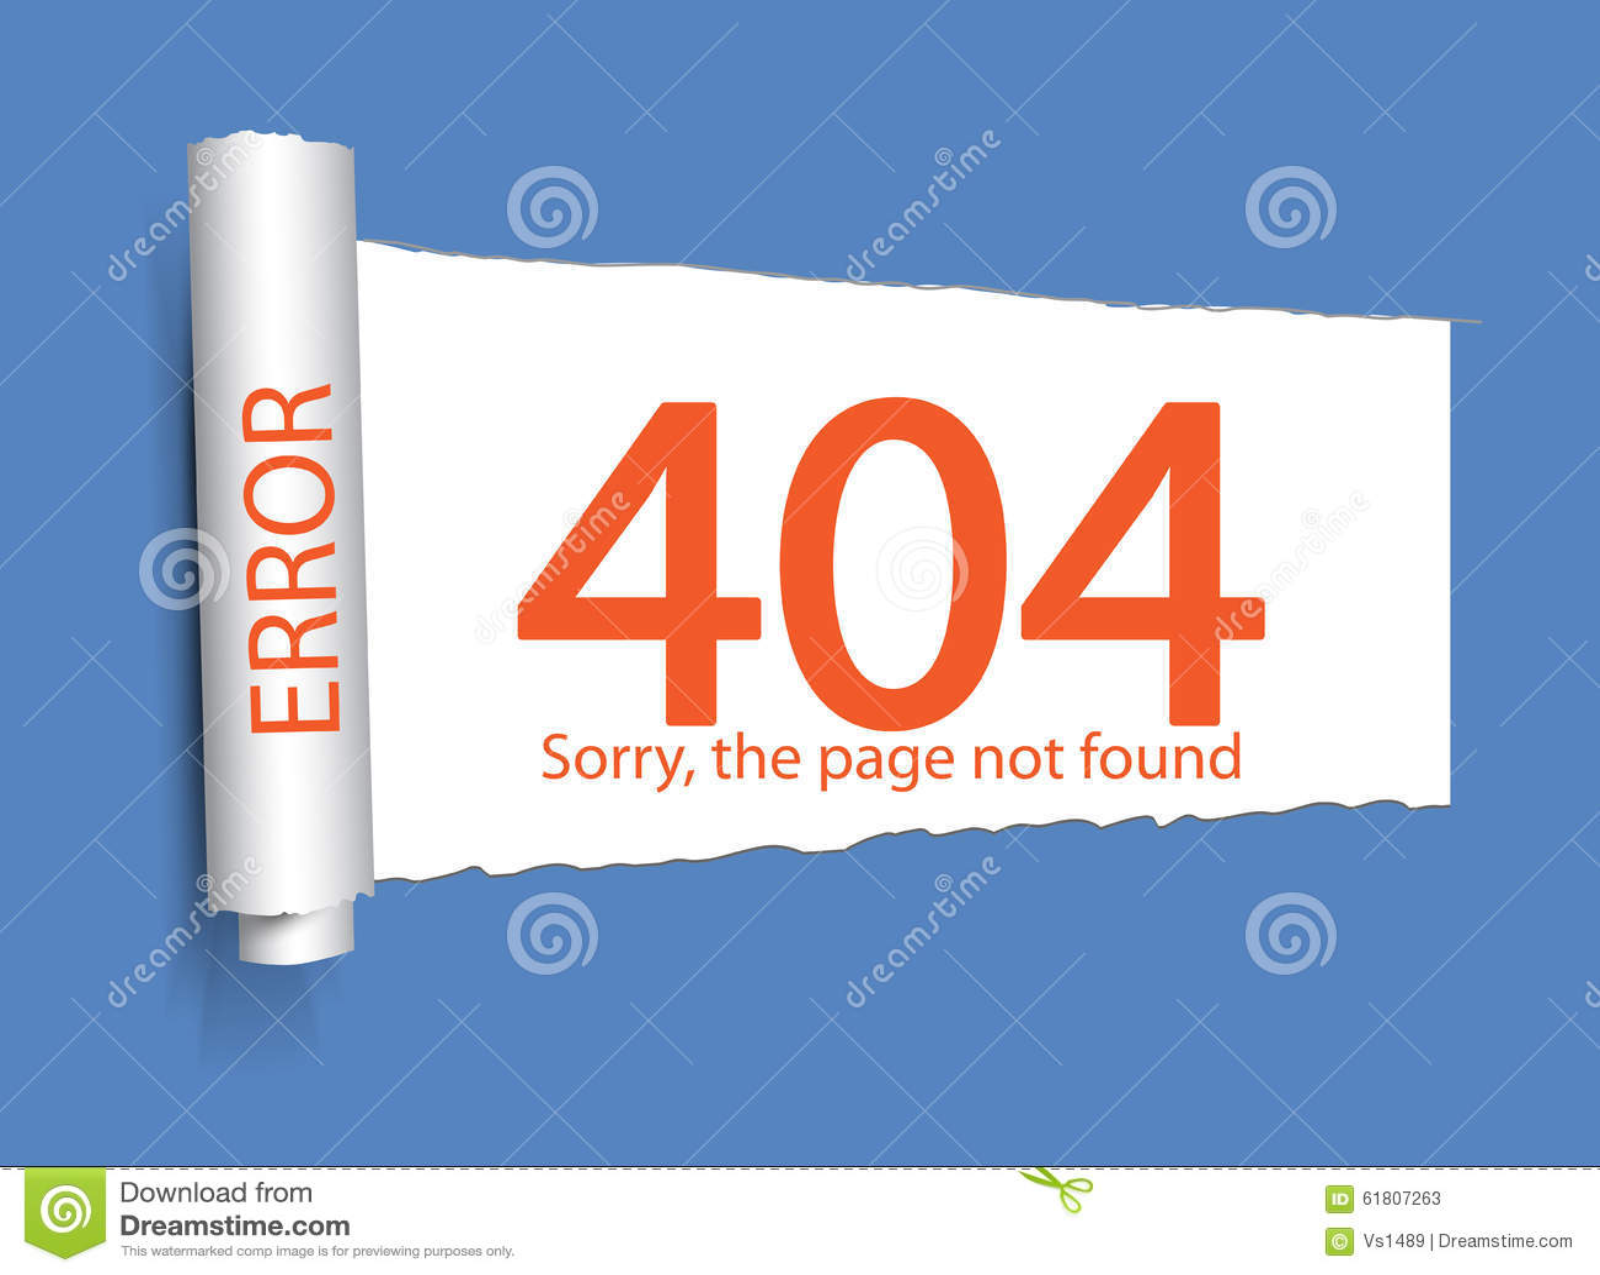 Background image 404 not found - 404 Abstract Background Break Connection Error Found